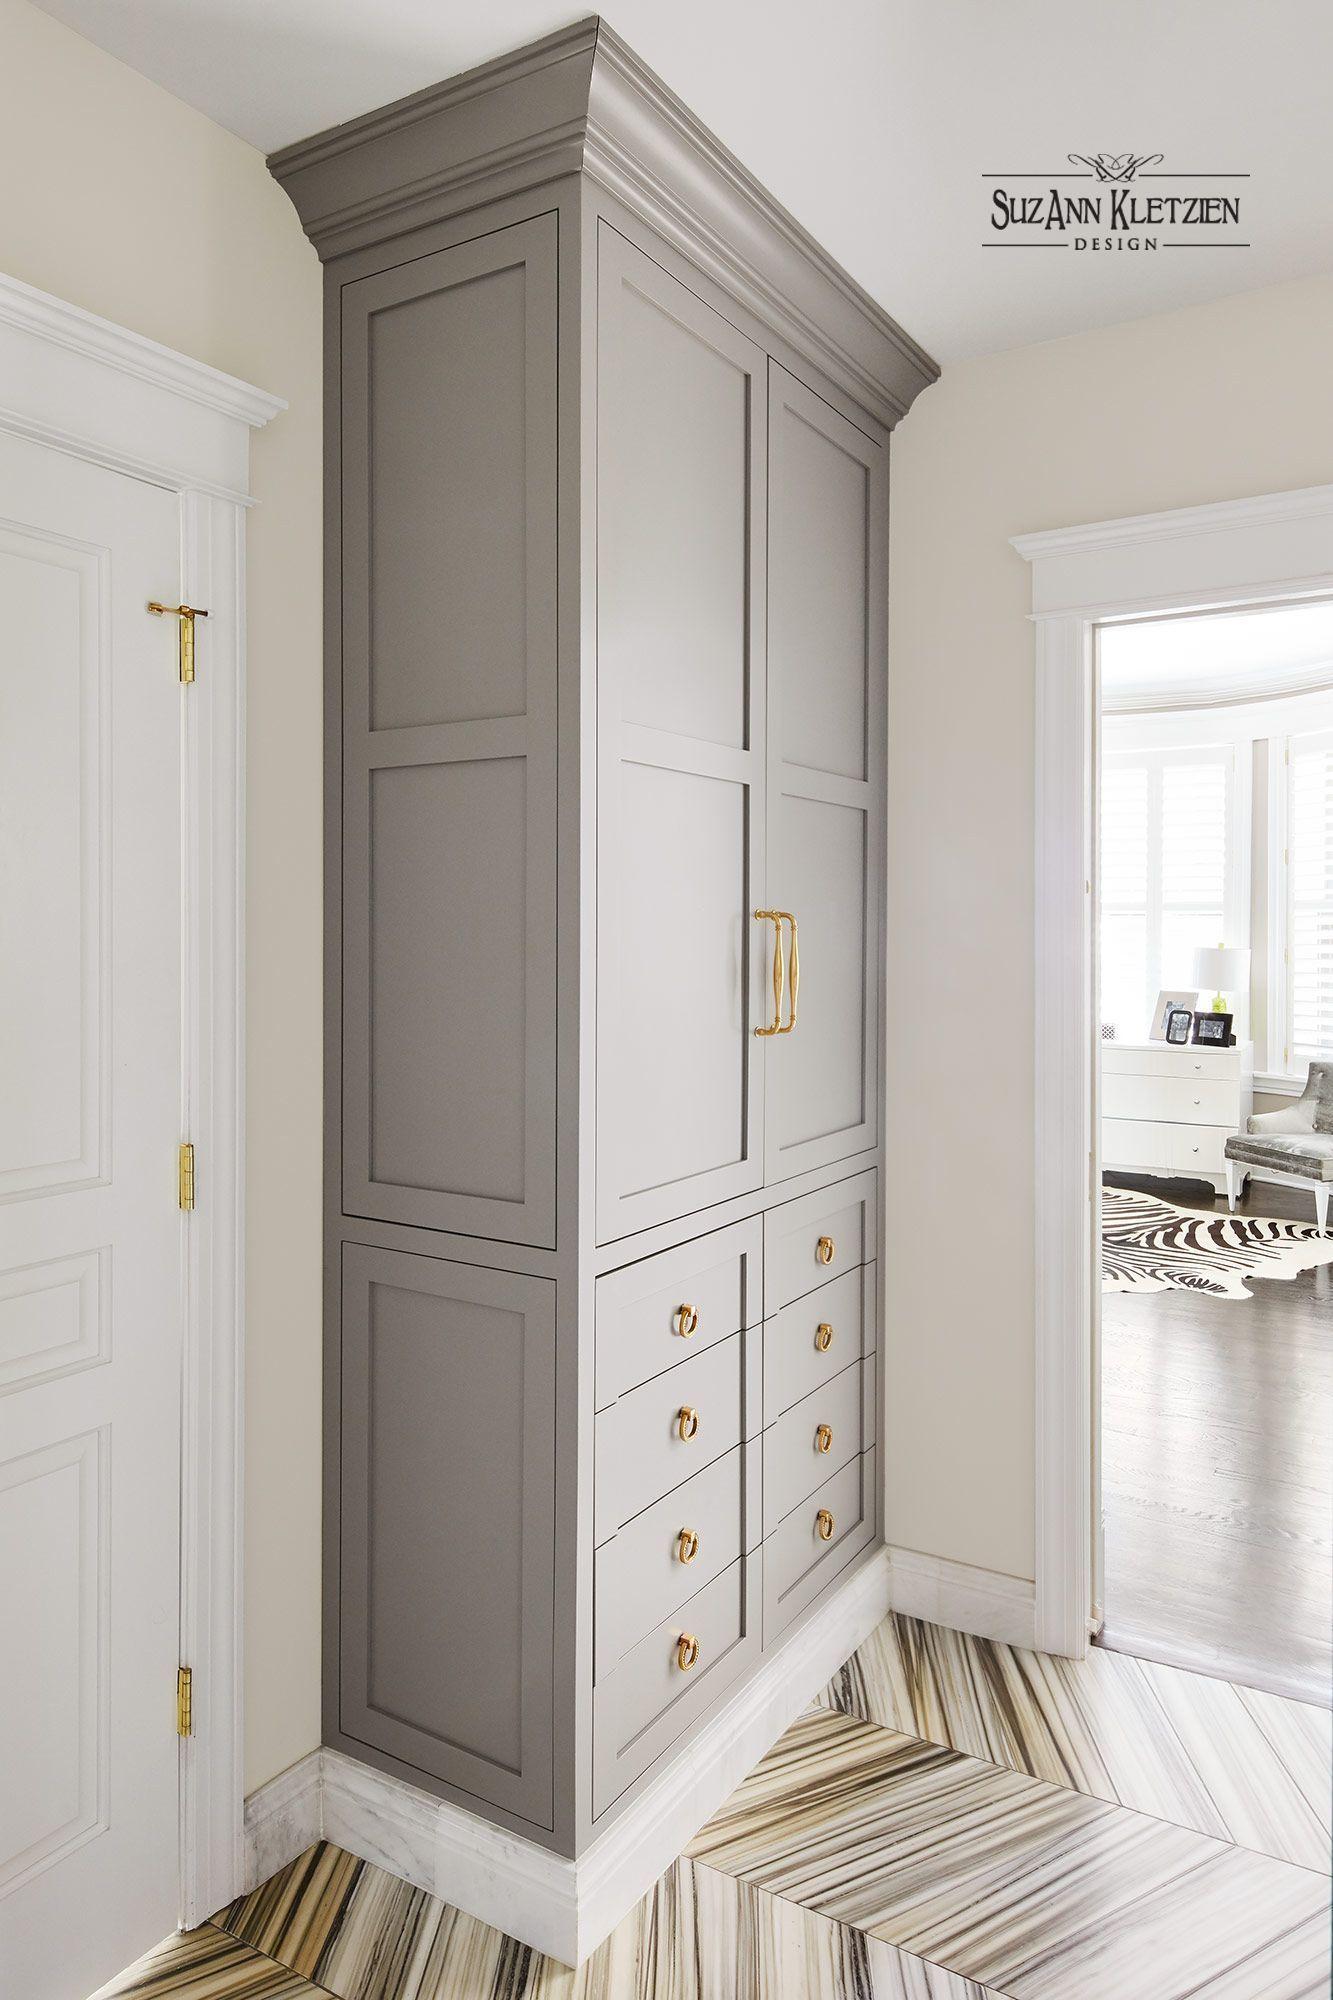 #Renovate bedroom   - Eingang   #Renovierenvorhernachher  #Renovierenideen